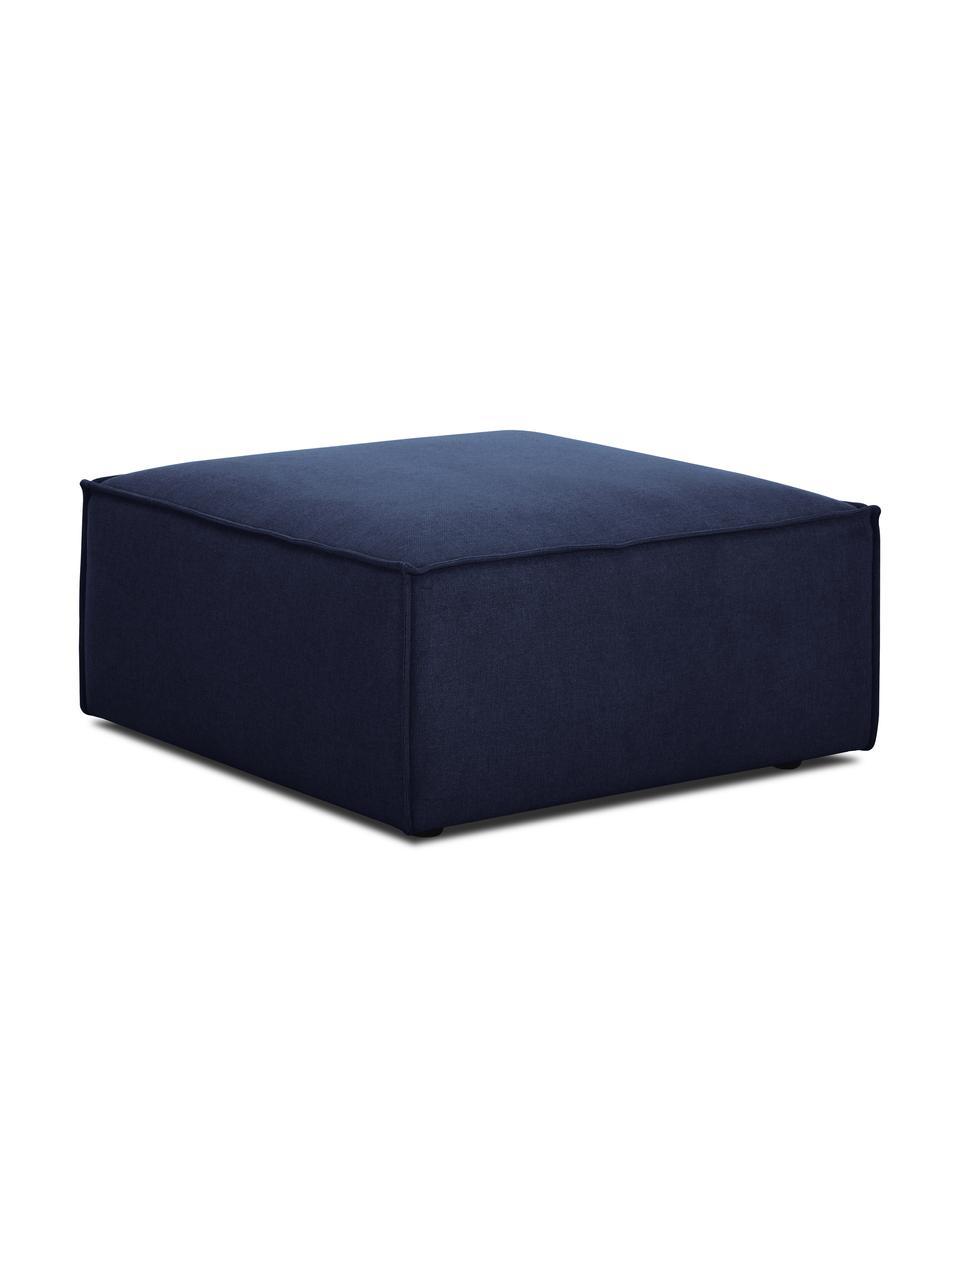 Voetenbank Lennon in blauw, Bekleding: 100% polyester De slijtva, Frame: massief grenenhout, multi, Poten: kunststof De poten bevind, Geweven stof blauw, 88 x 43 cm